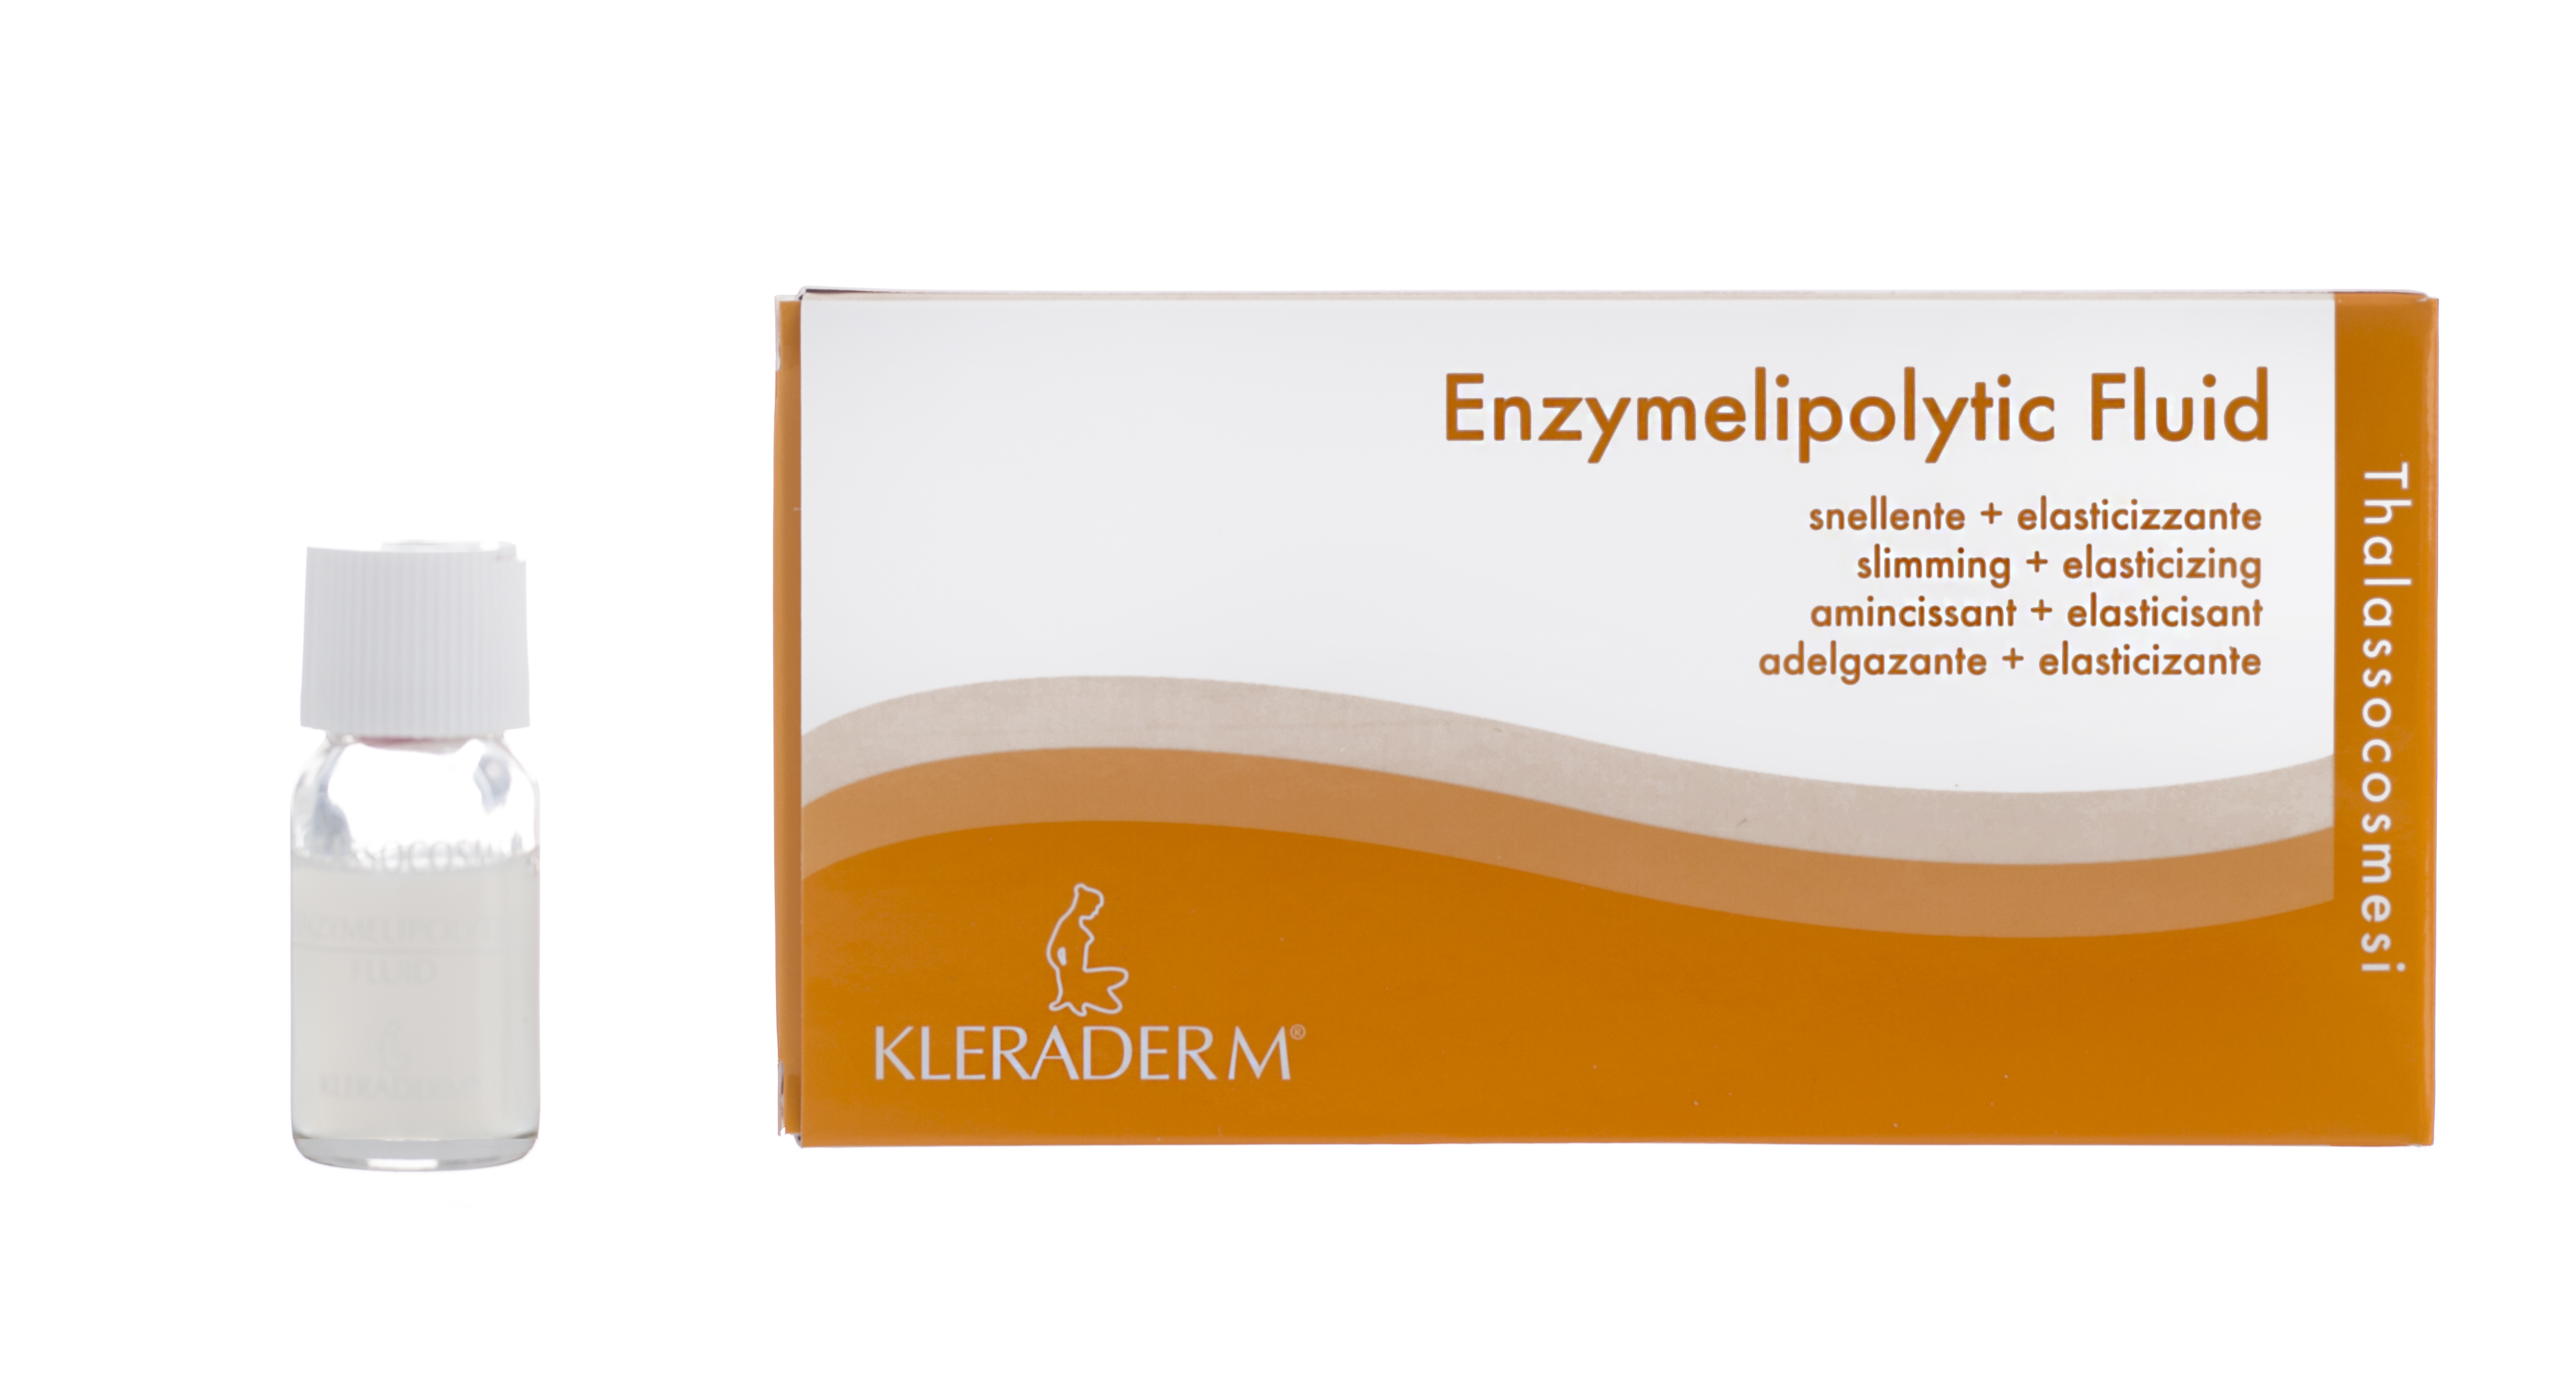 Enzymelipolytic Fluid – Αμπούλες για λιπόλυση & κυτταρίτιδα